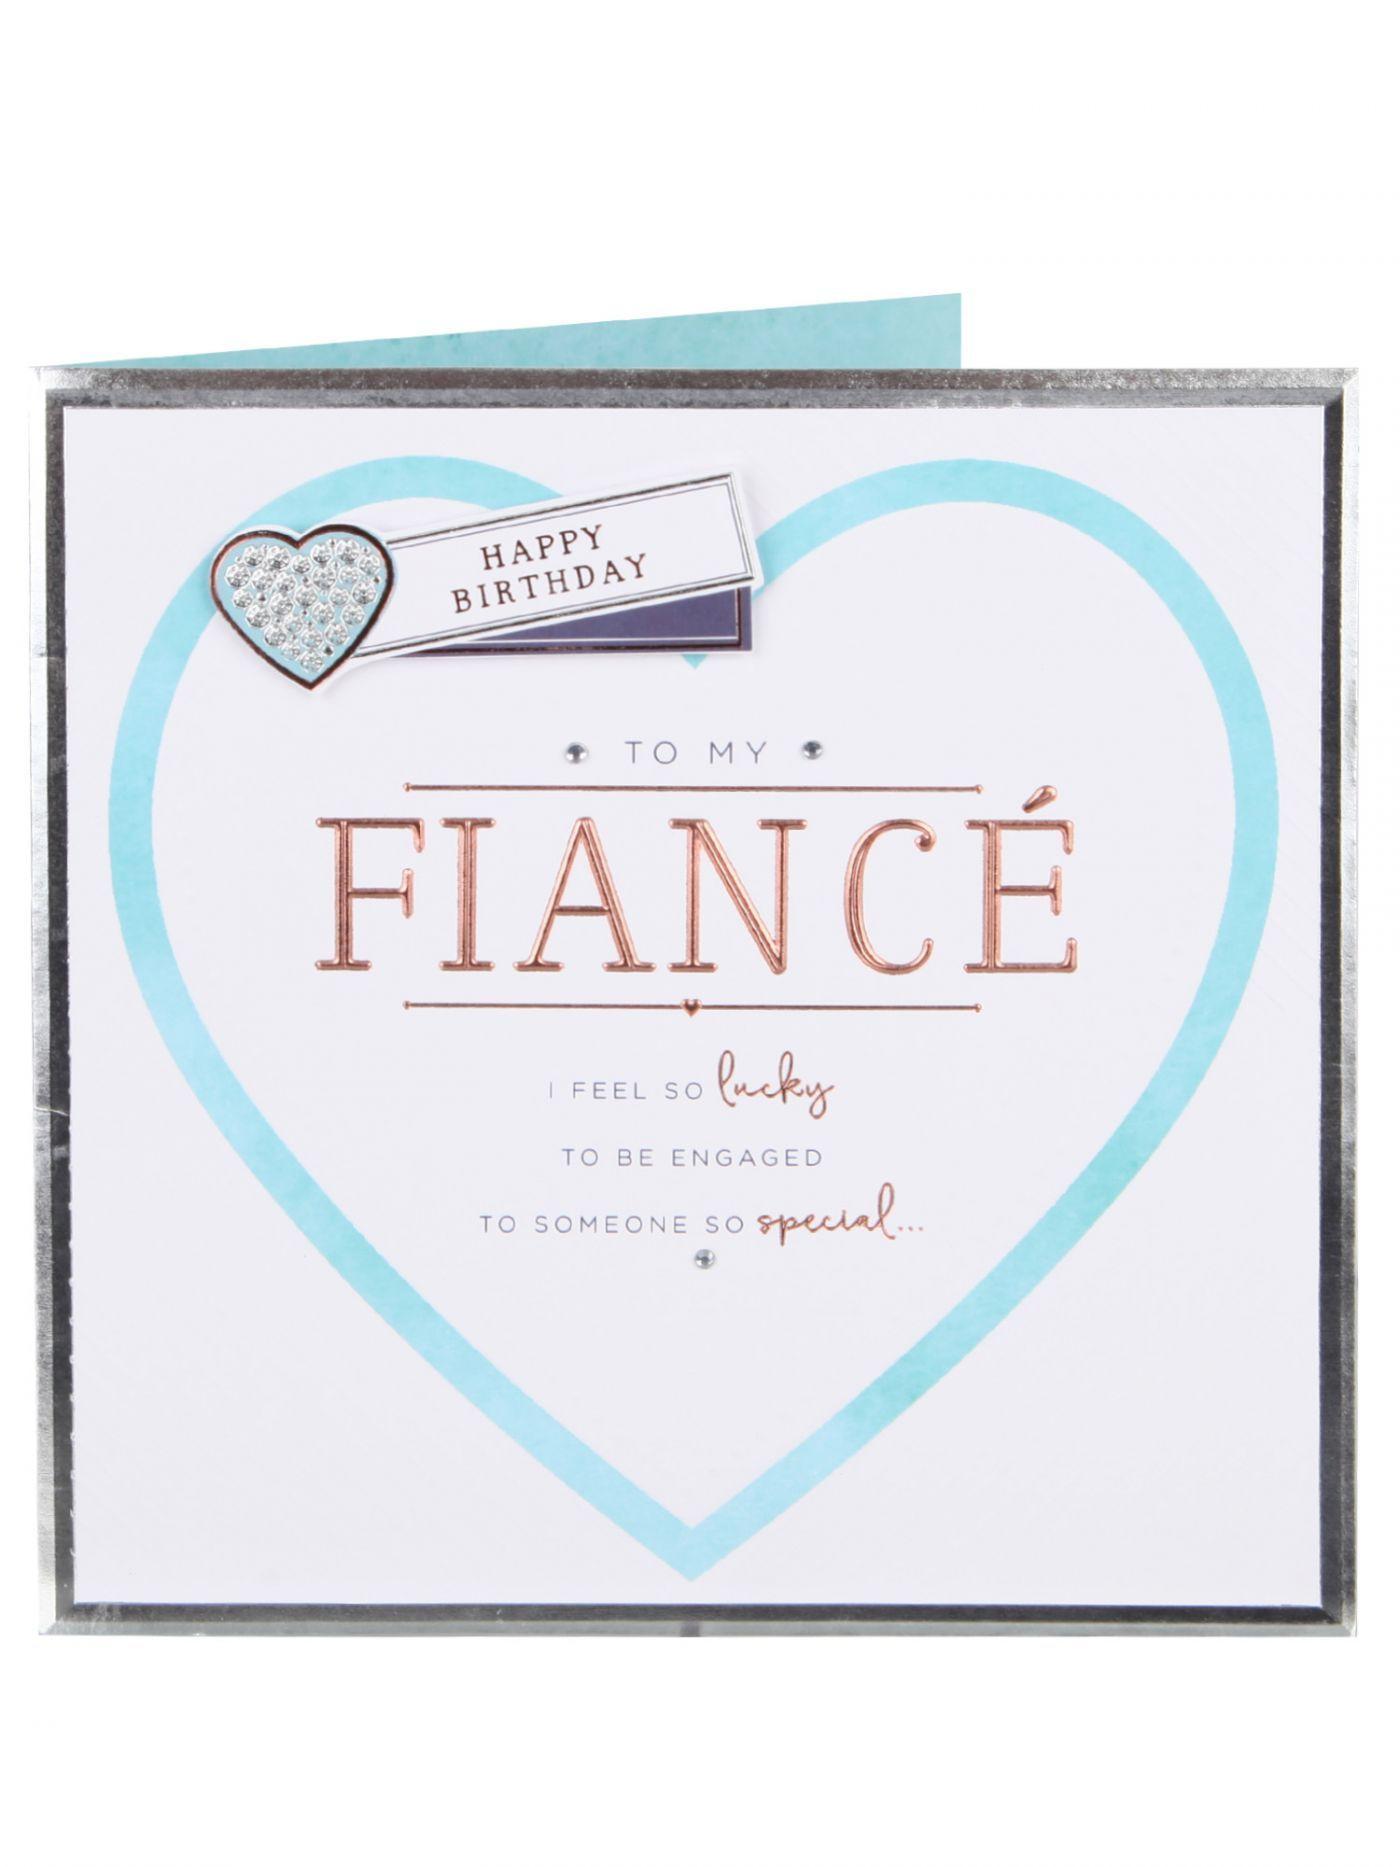 My Special Fiance Birthday Card Birthday Cards Cards Clintons Fiance Birthday Quotes Birthday Captions Birthday Wishes For Fiance